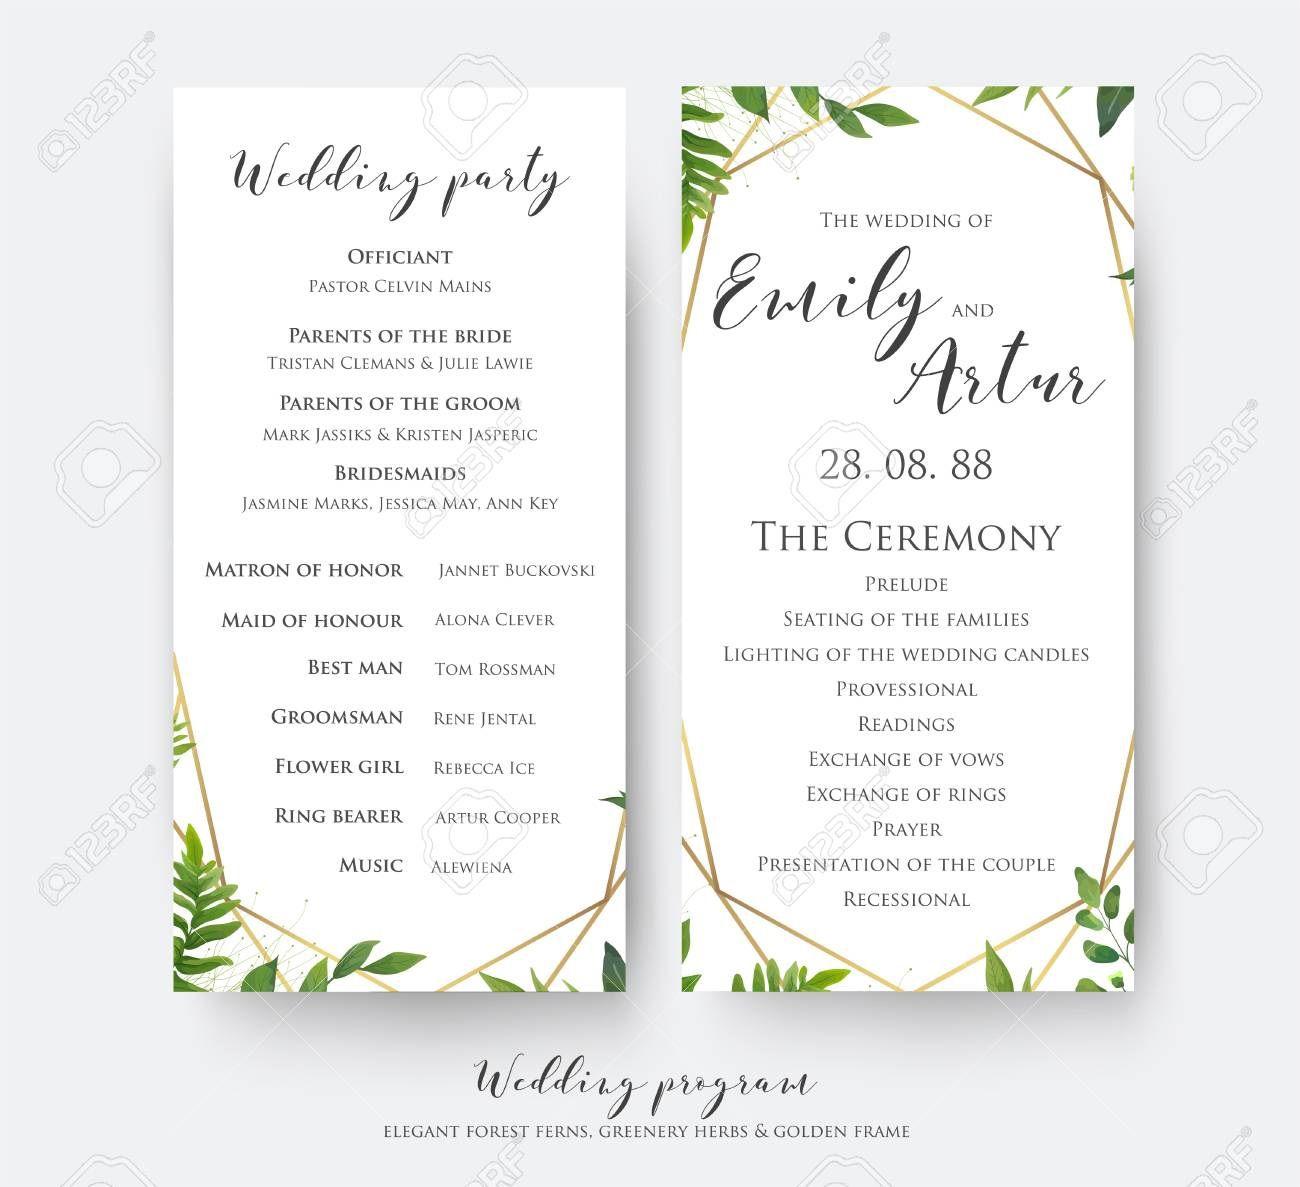 002 Striking Template For Wedding Program Inspiration  Word Free CatholicFull